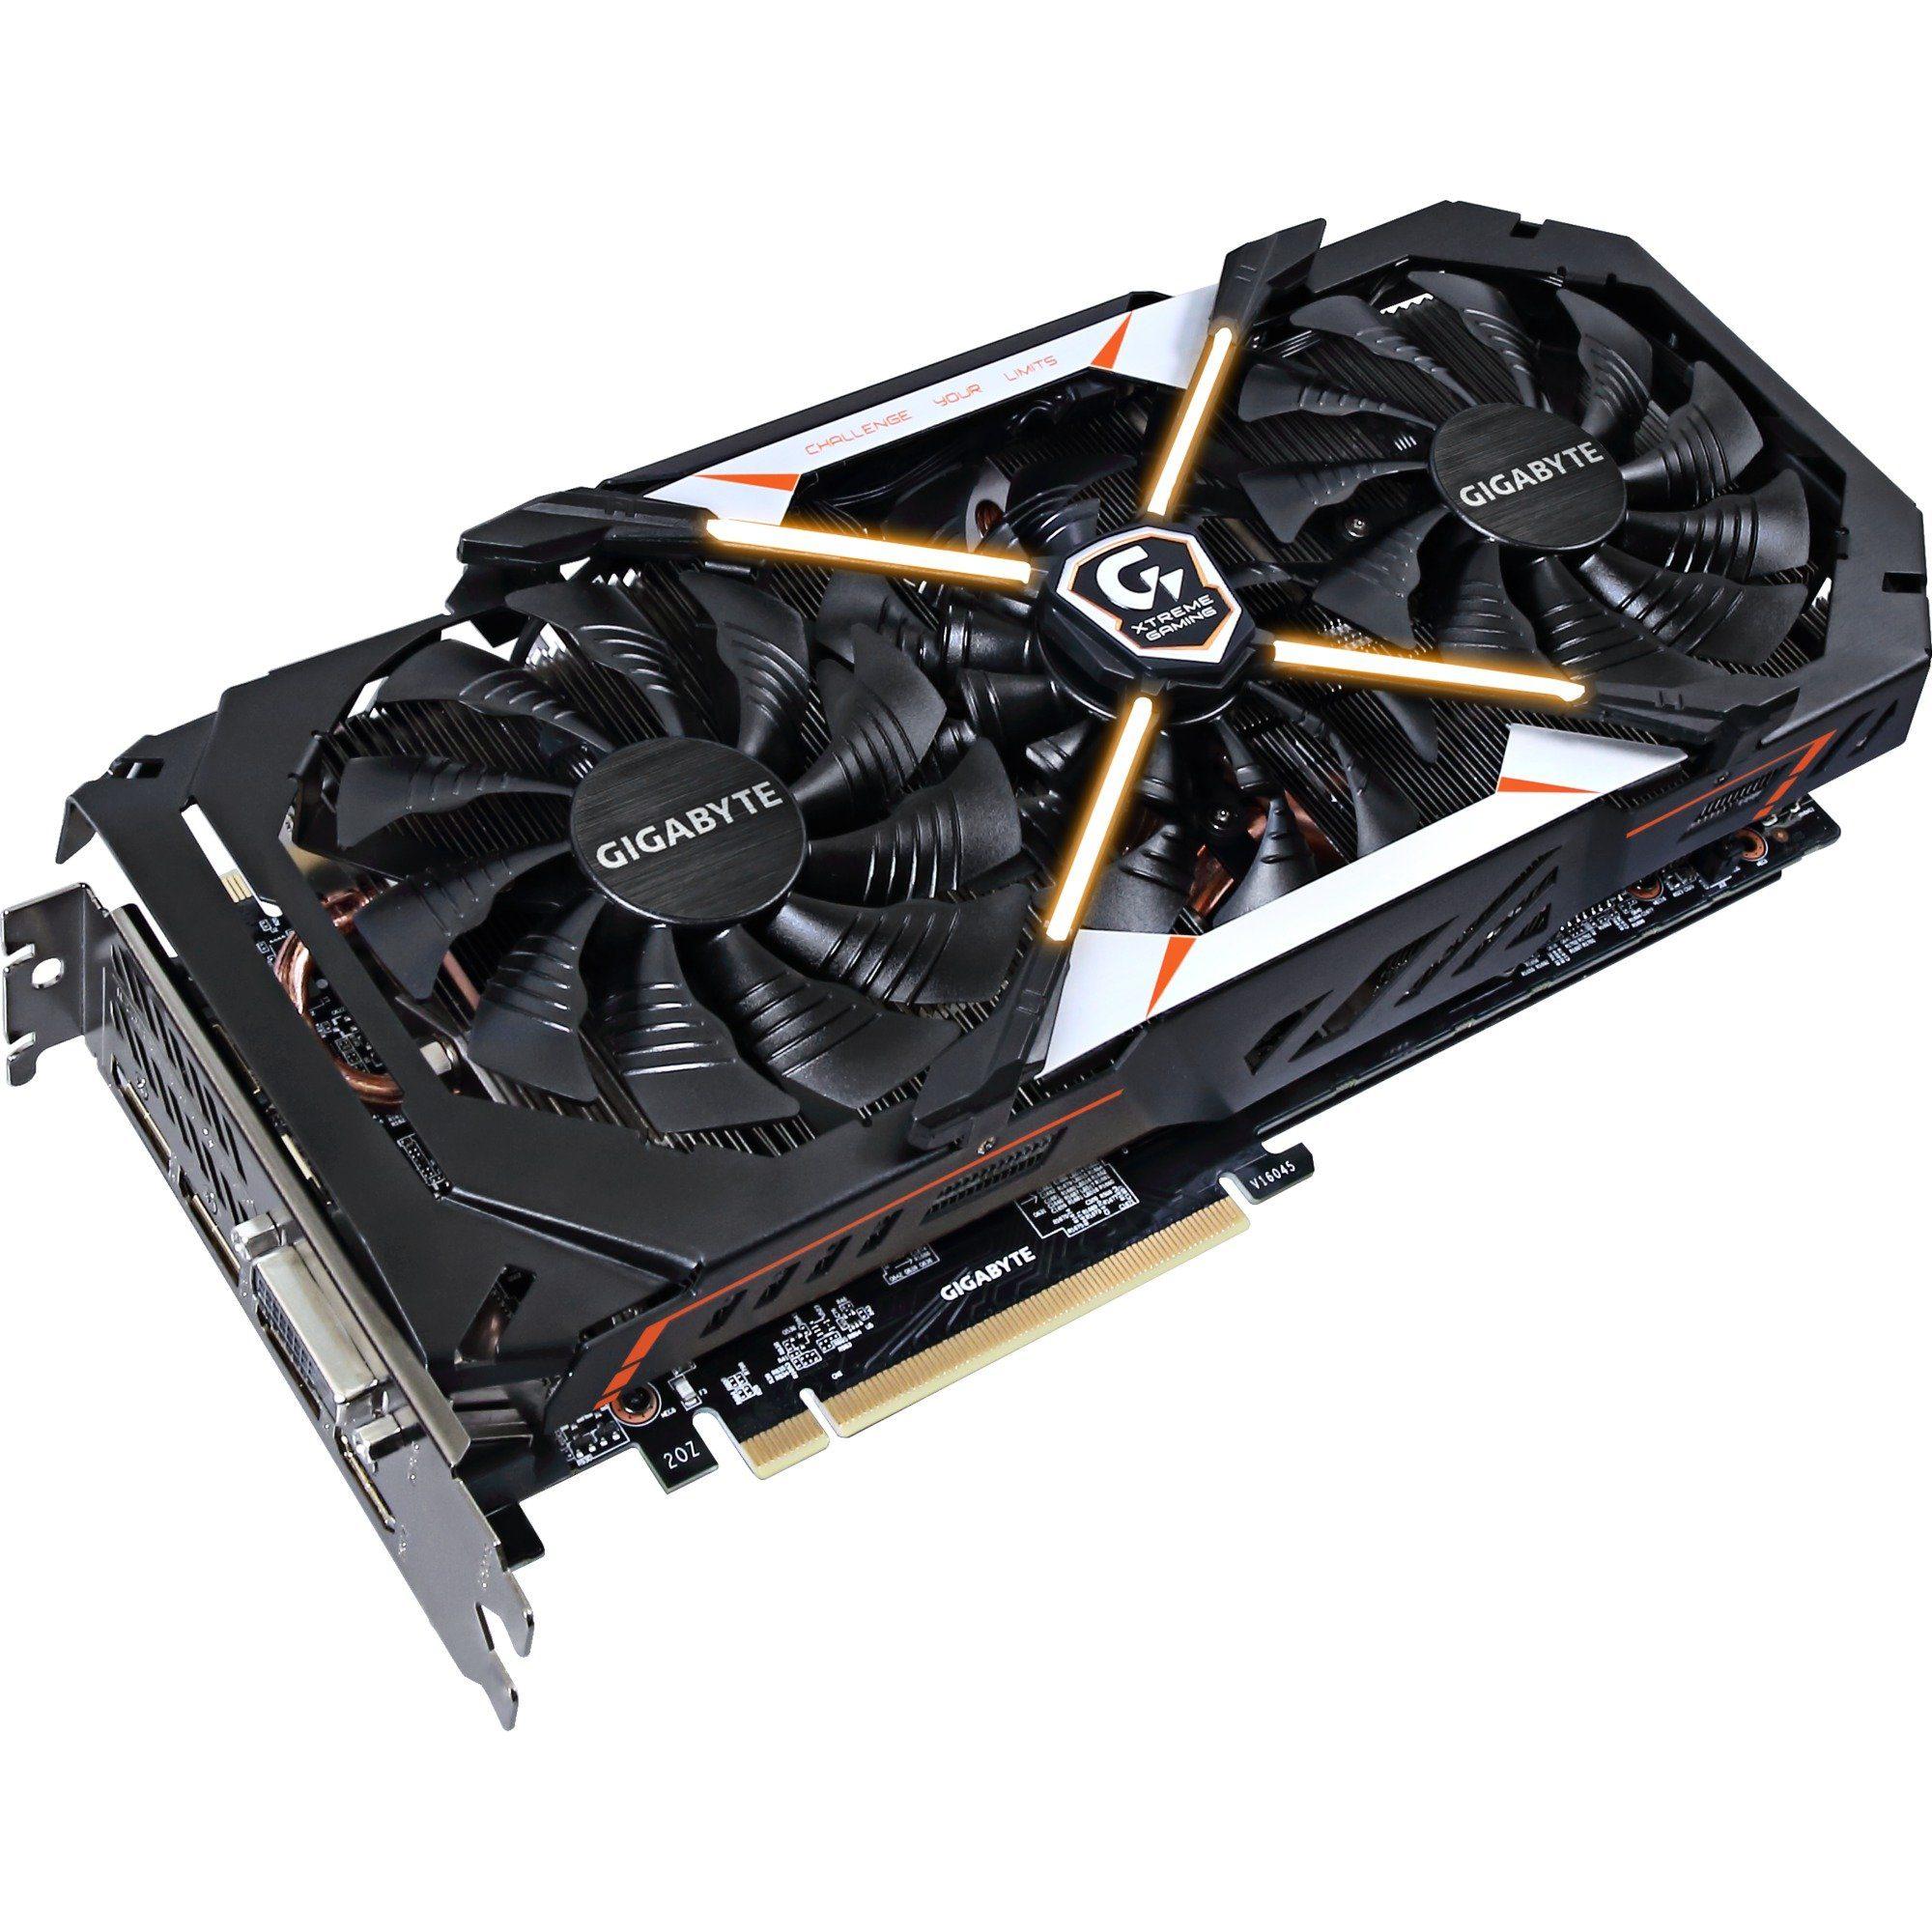 GIGABYTE Grafikkarte »GeForce GTX 1080 Xtreme Gaming Premium Pack«